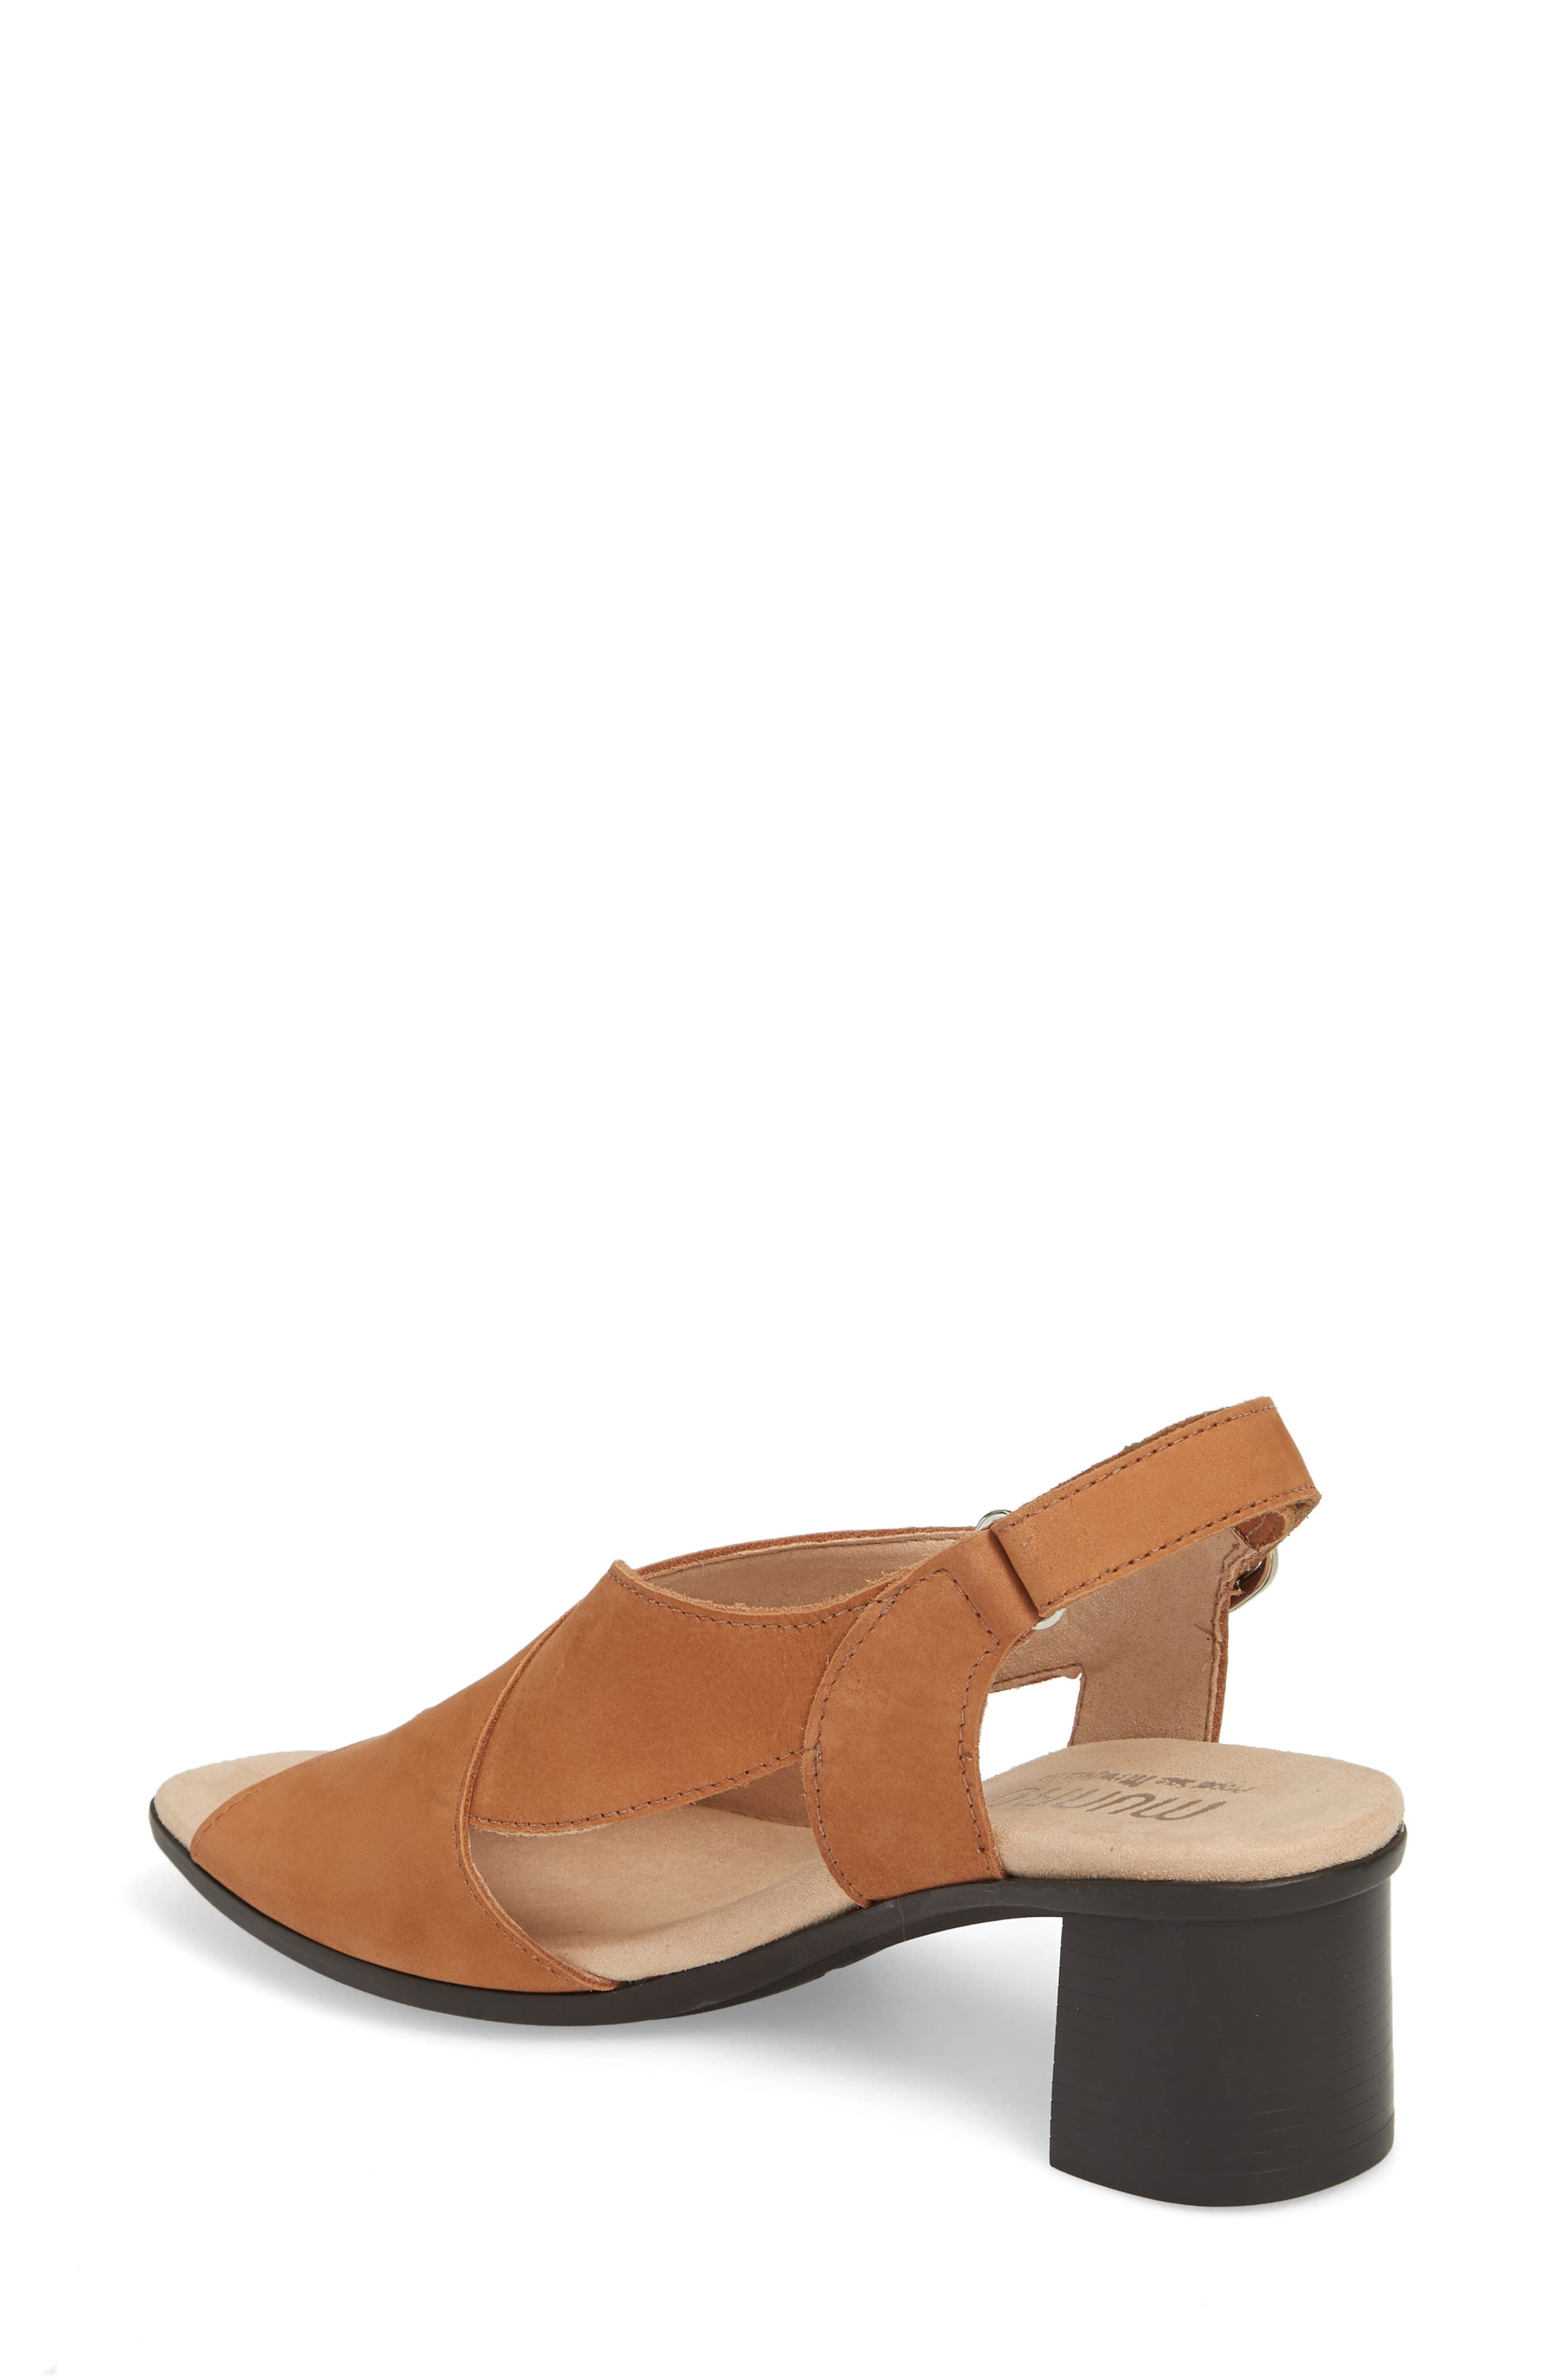 Laine Block Heel Sandal,                             Alternate thumbnail 2, color,                             Brown Nubuck Leather